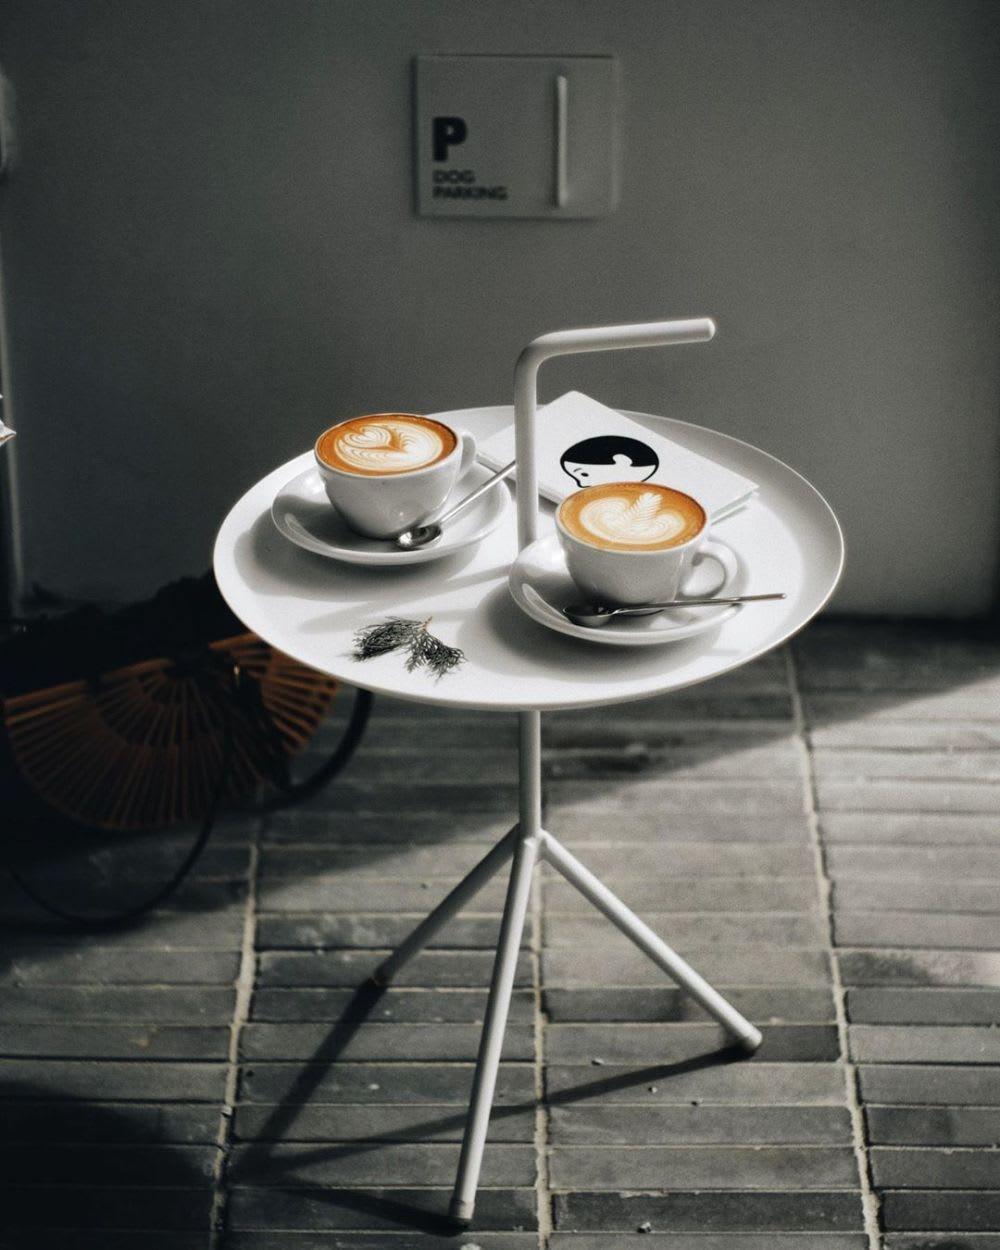 Coffe photography